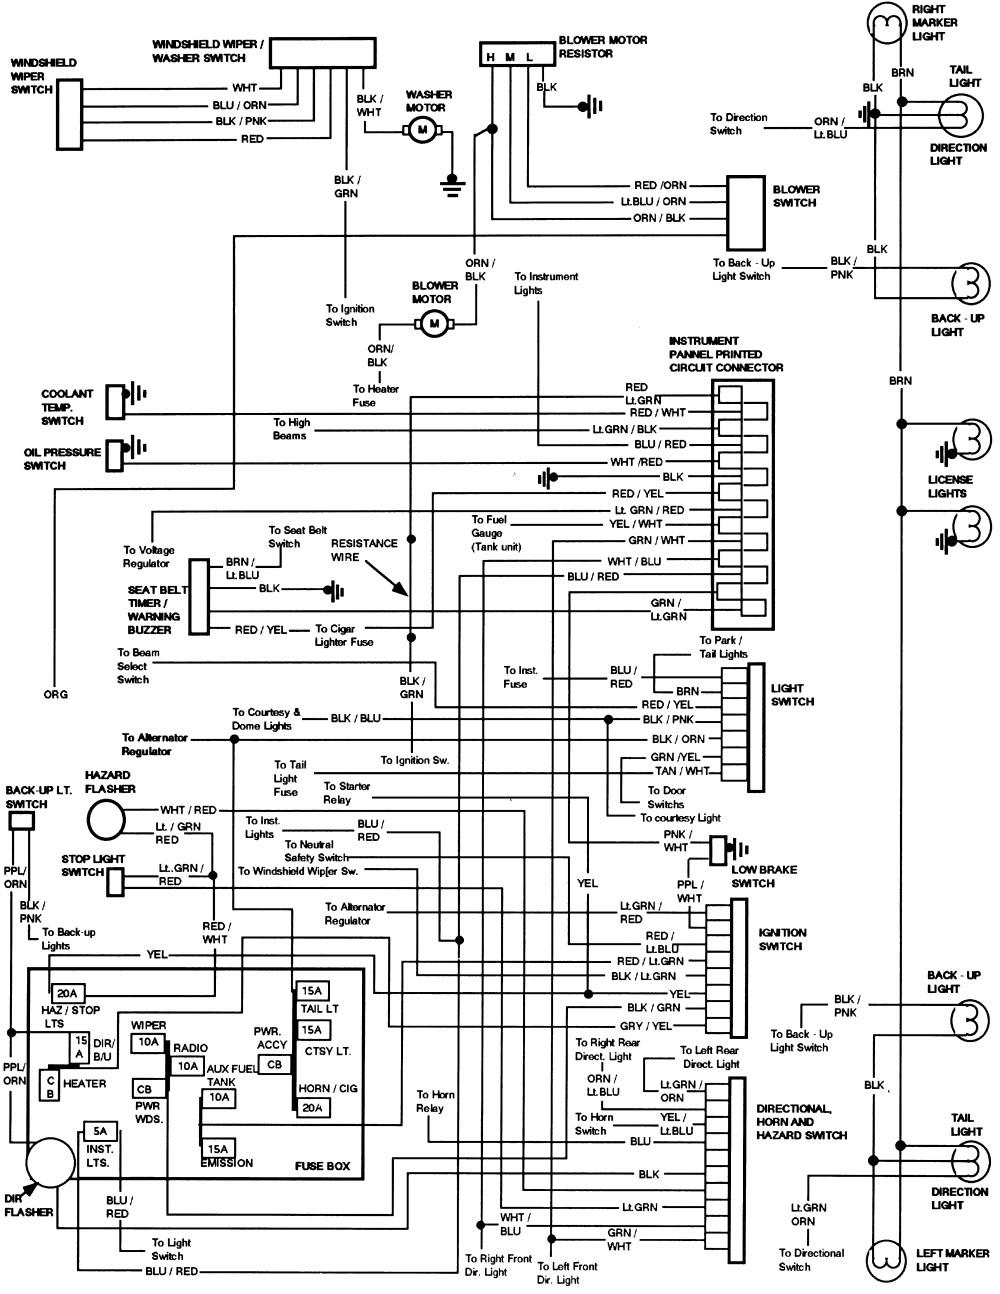 [DIAGRAM] 84 F150 Wiring Diagram Free Download Schematic